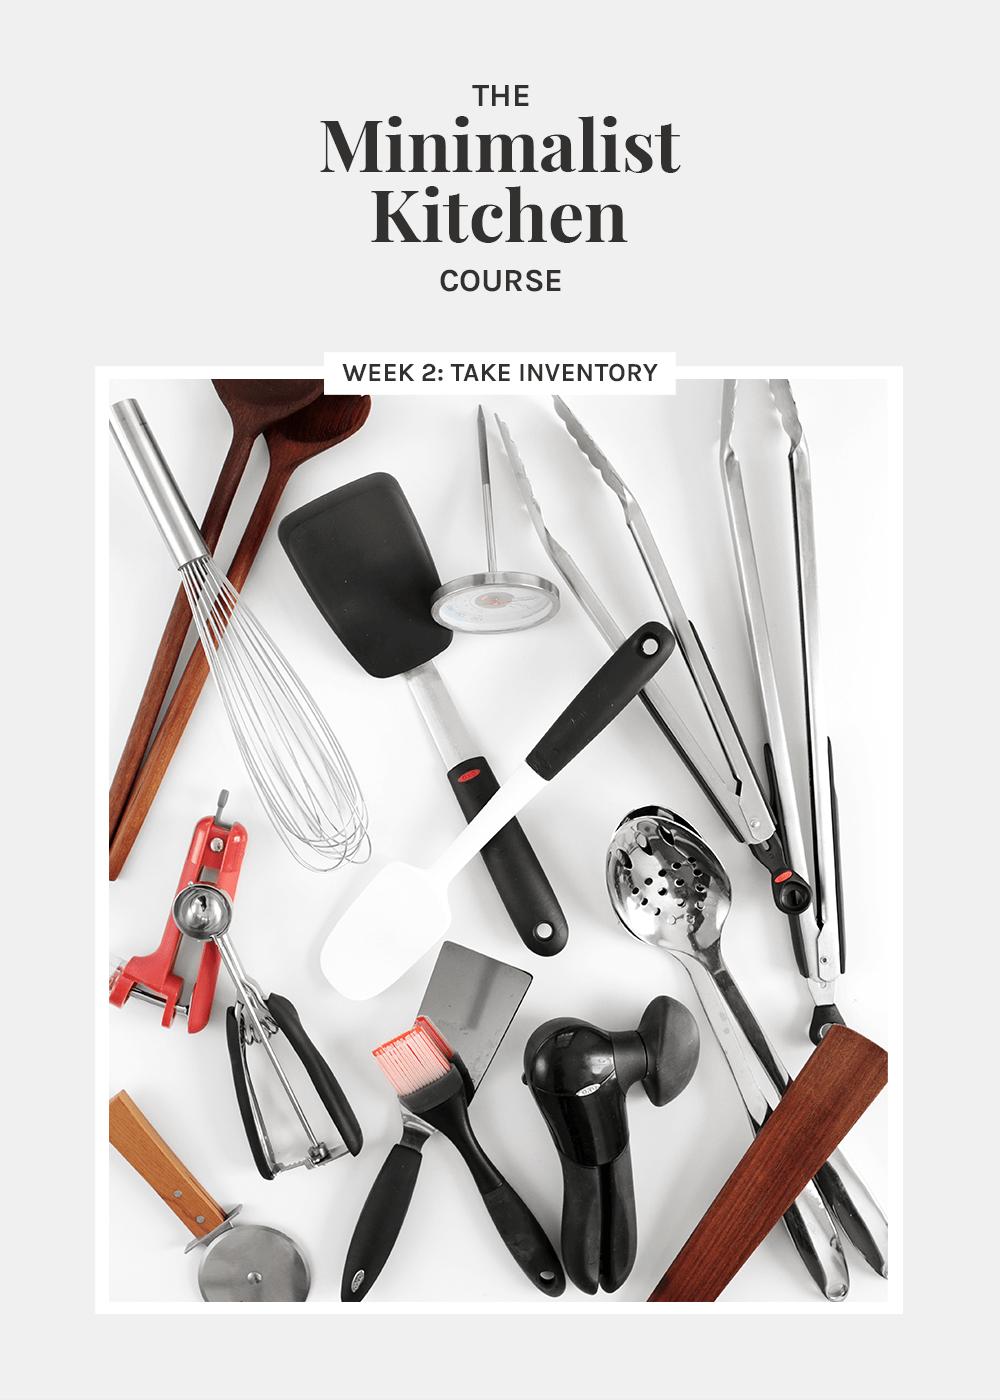 The Minimalist Kitchen course Week 2 Take Inventory